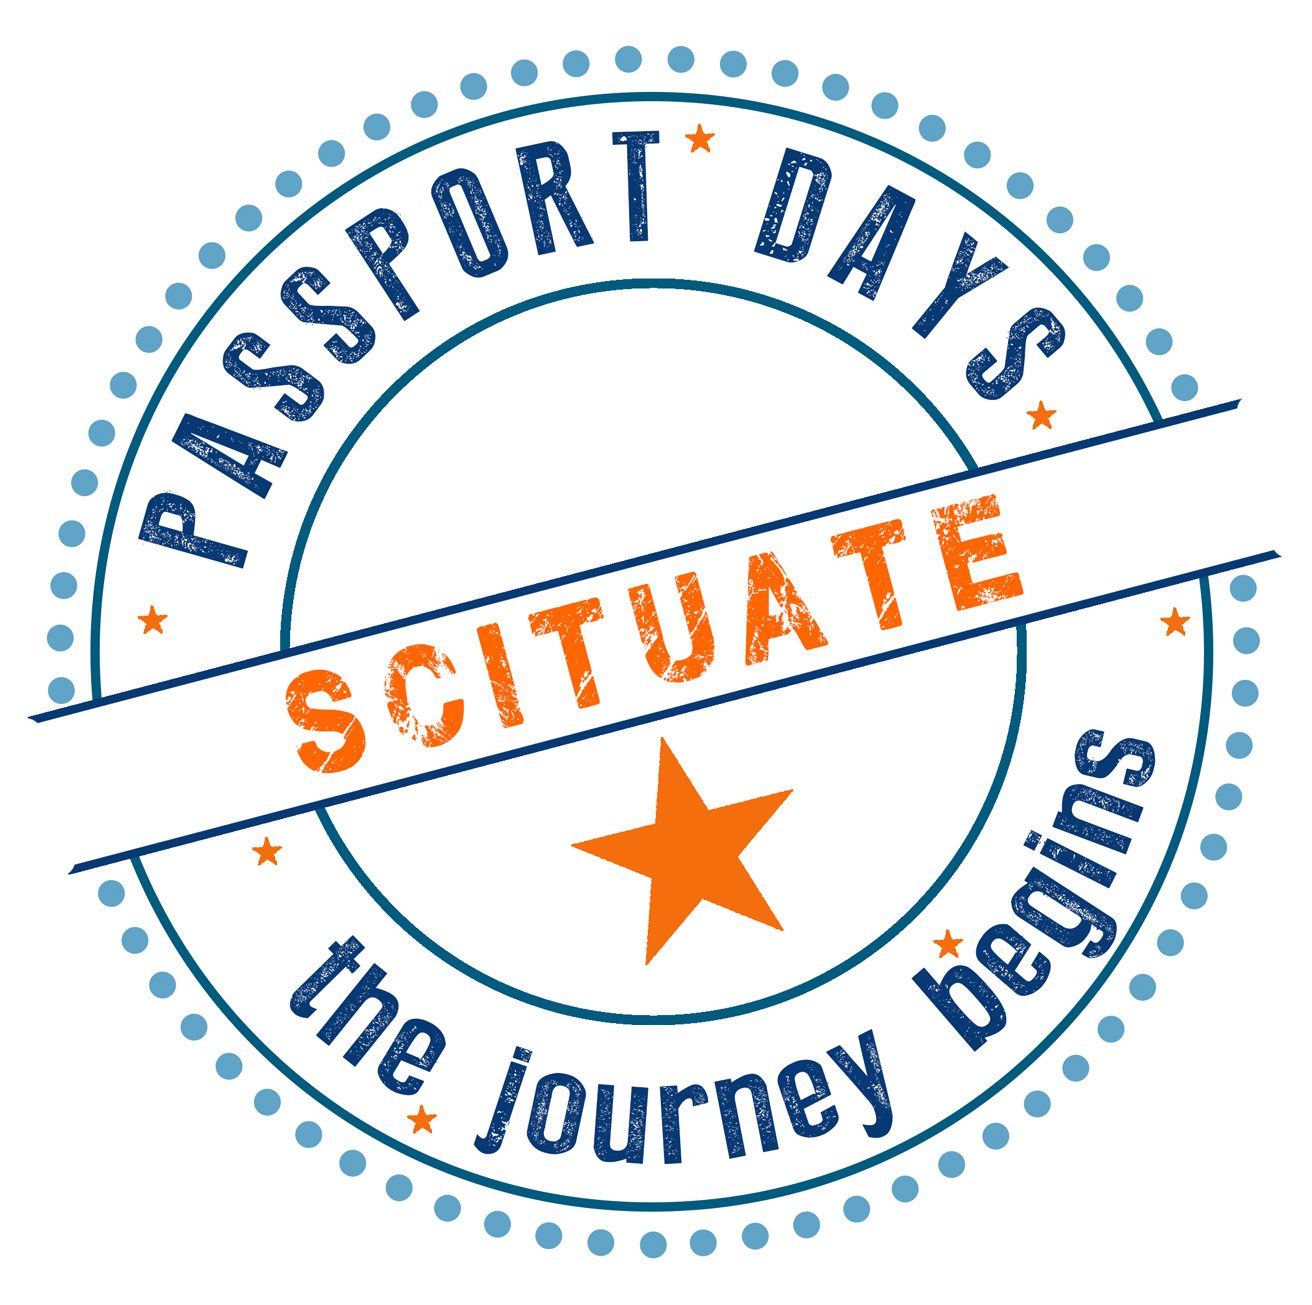 passportSEFsmall.jpg